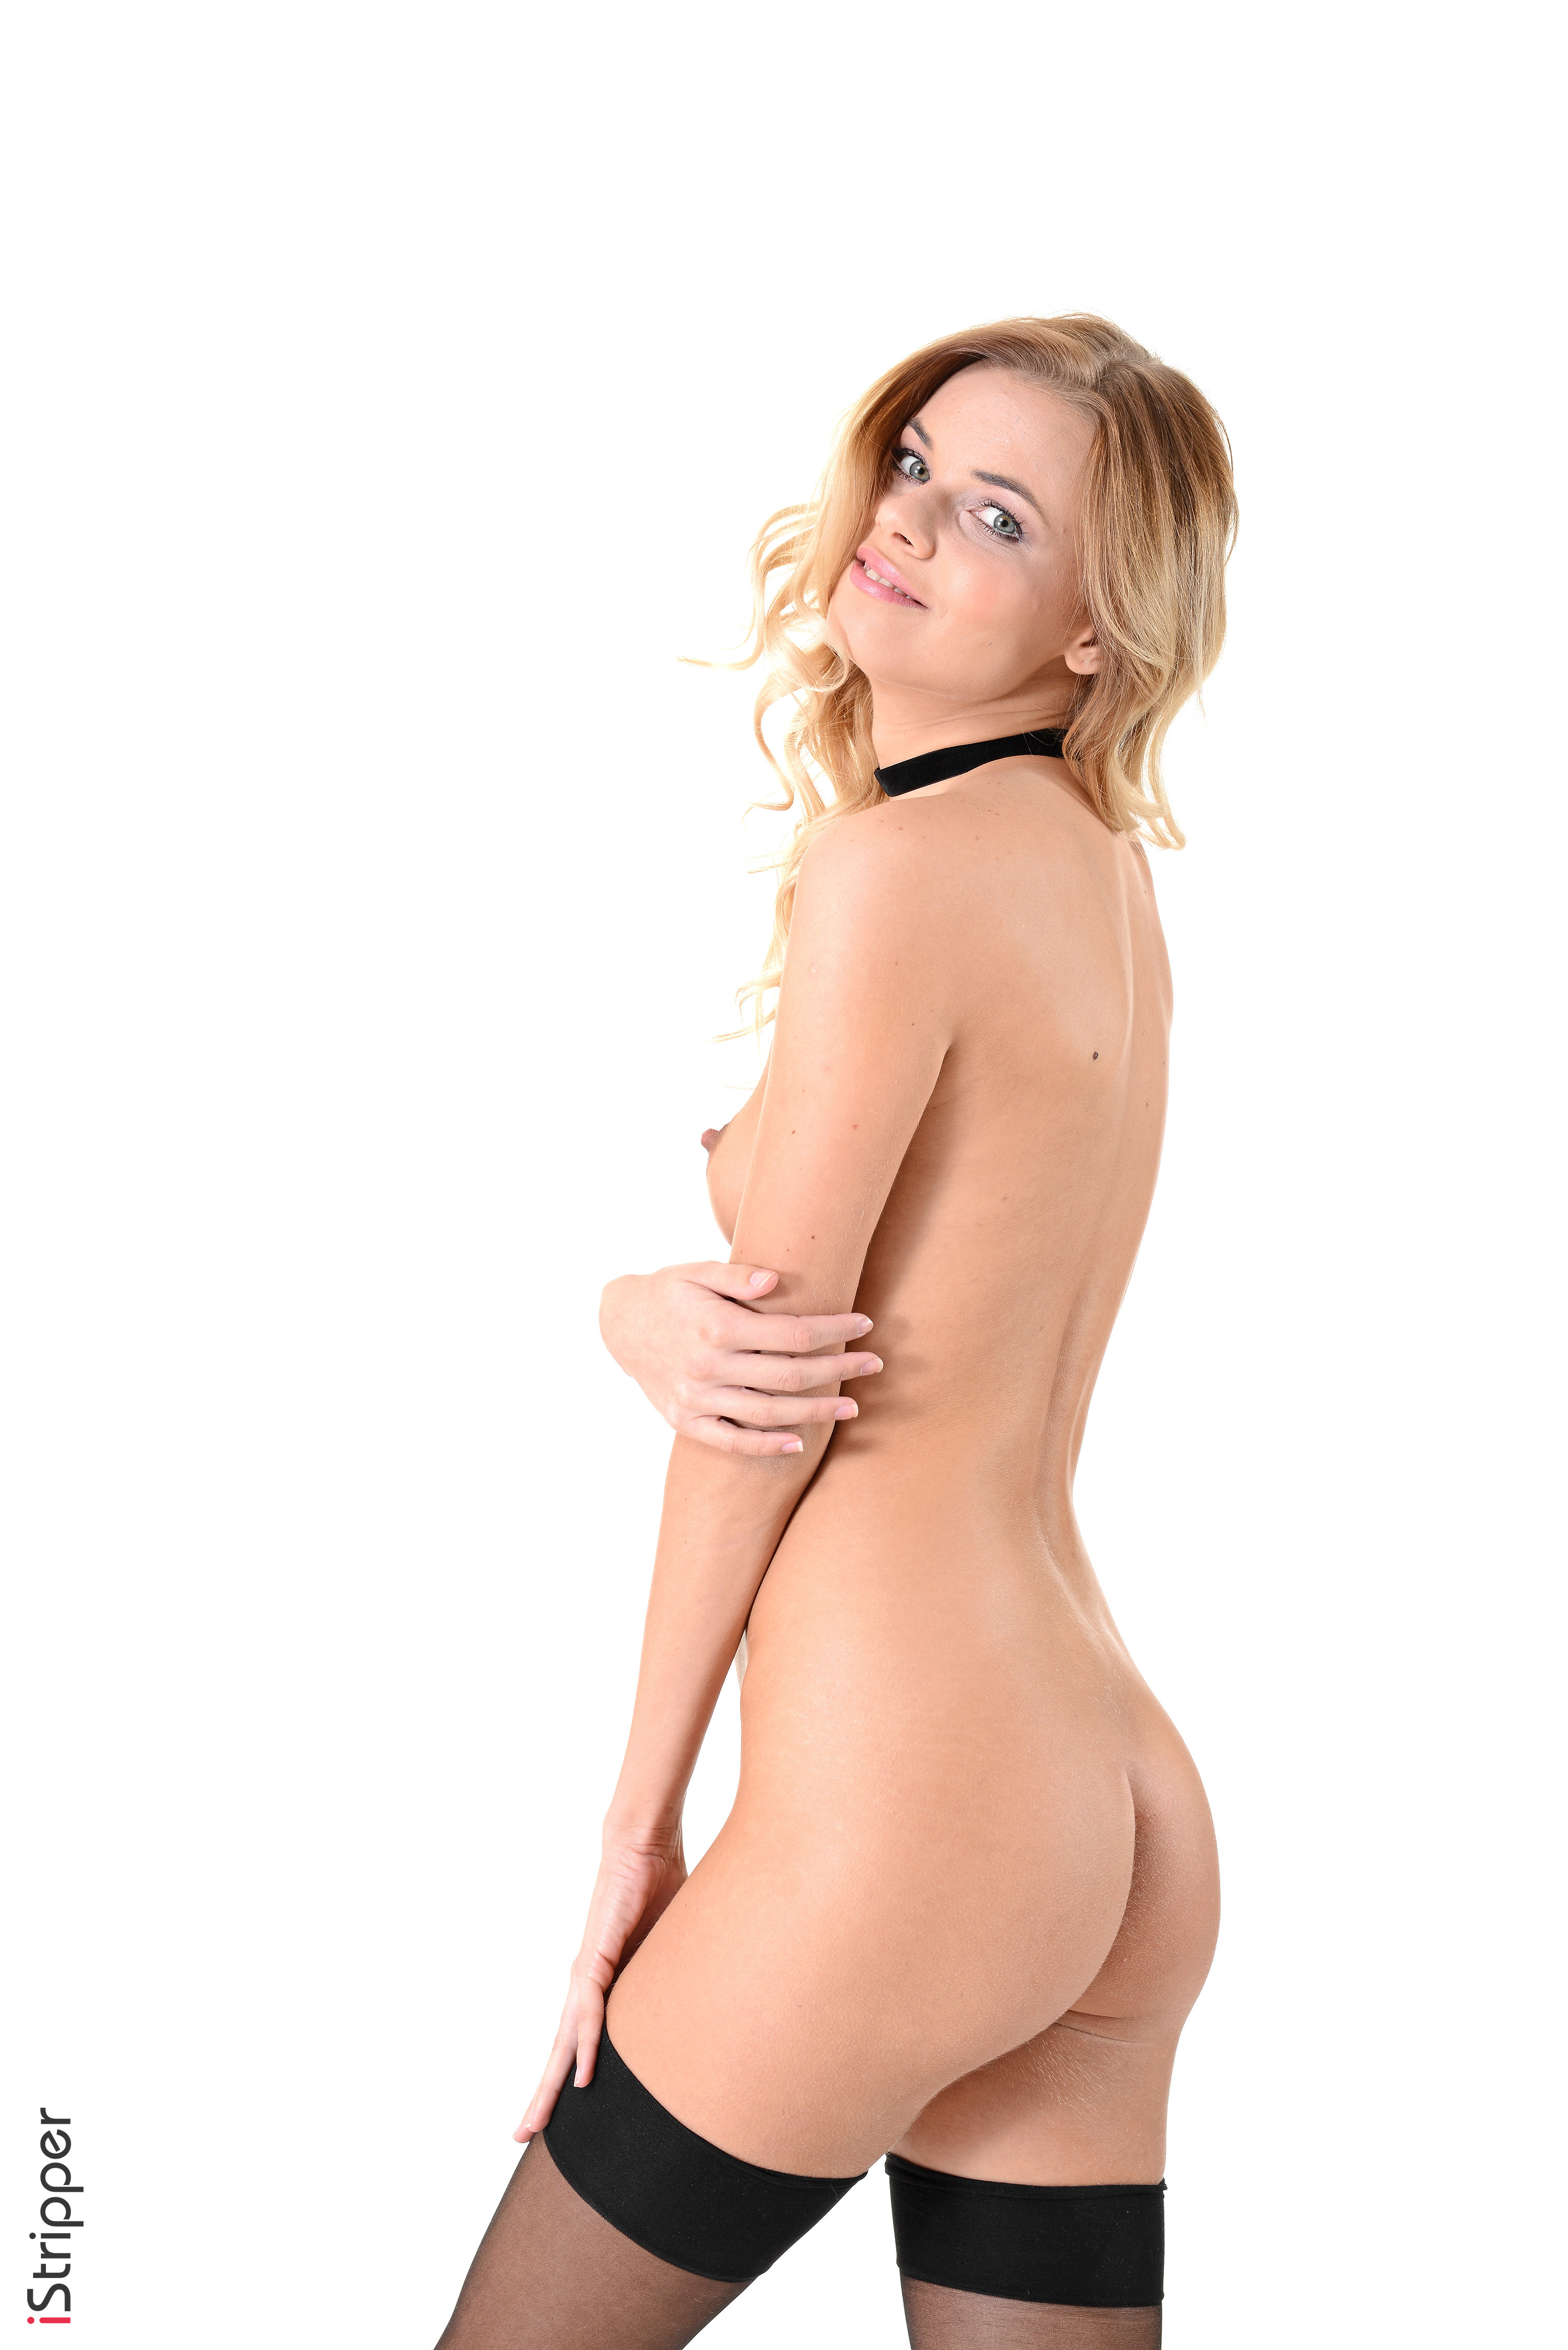 naked women backgrounds